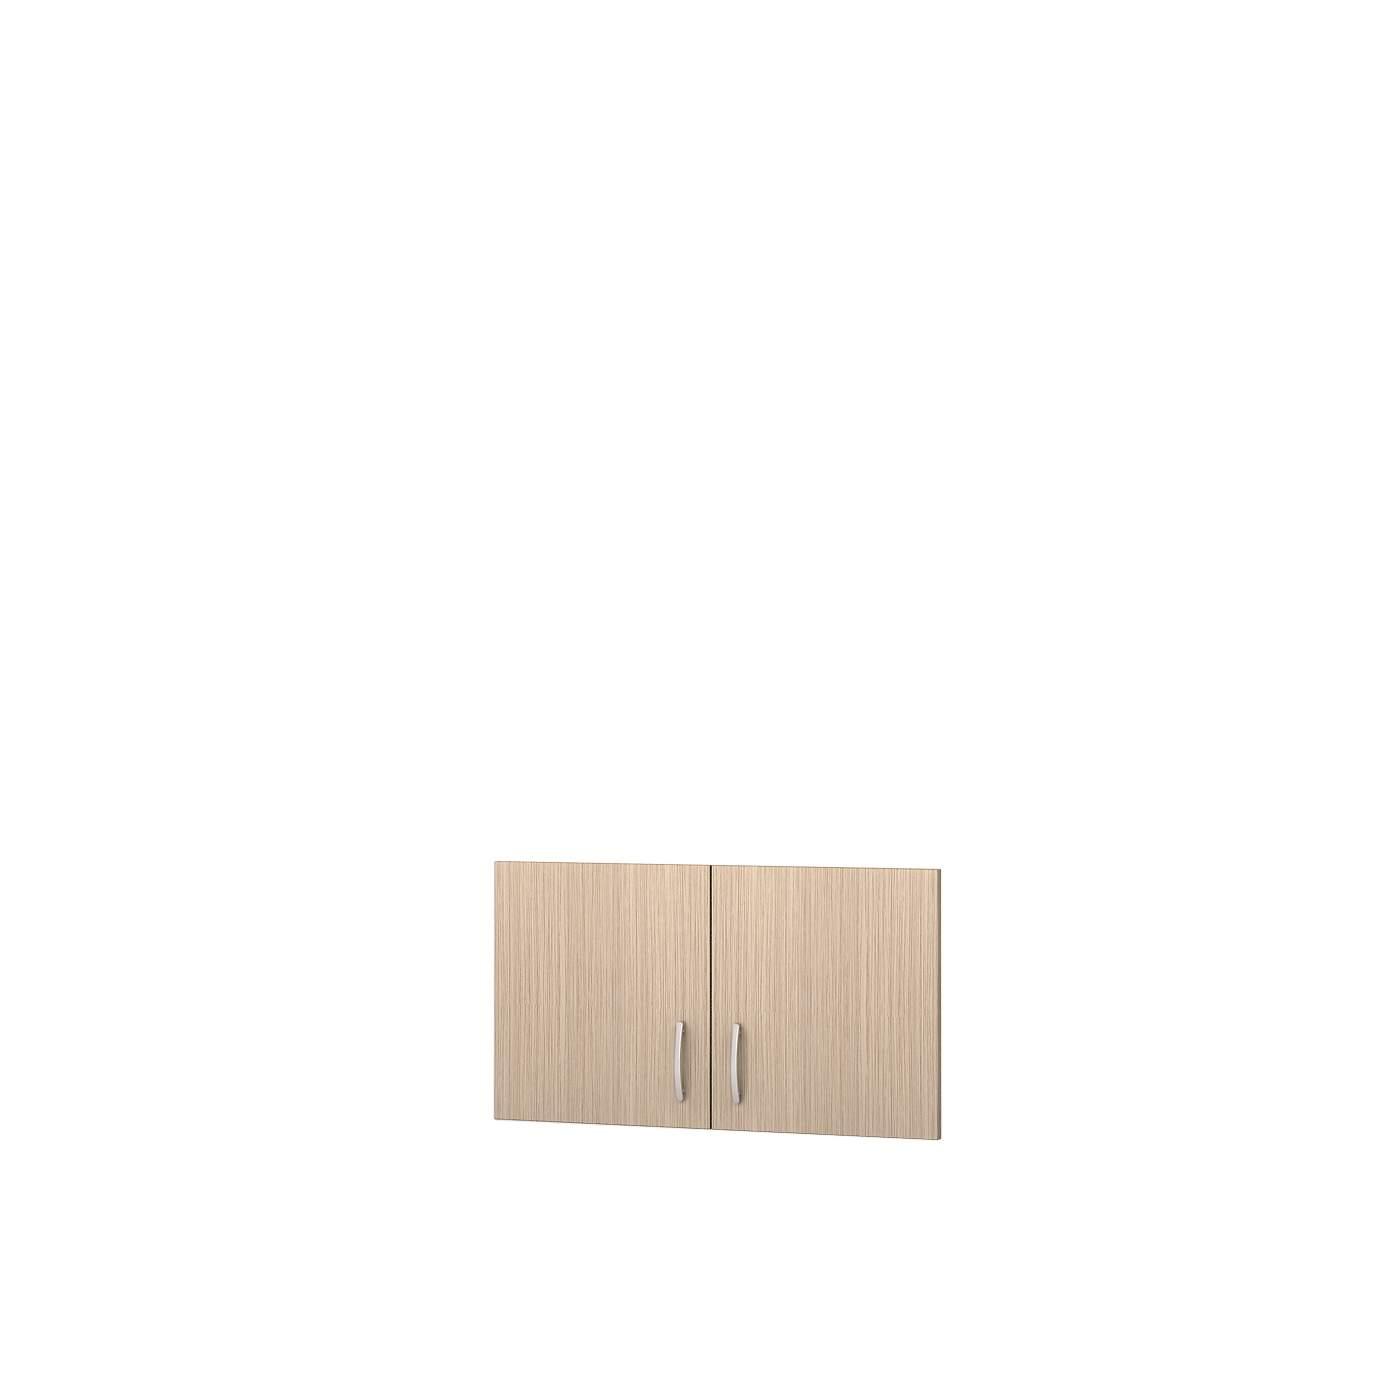 Двери для антресоли 2х(360х394х16)